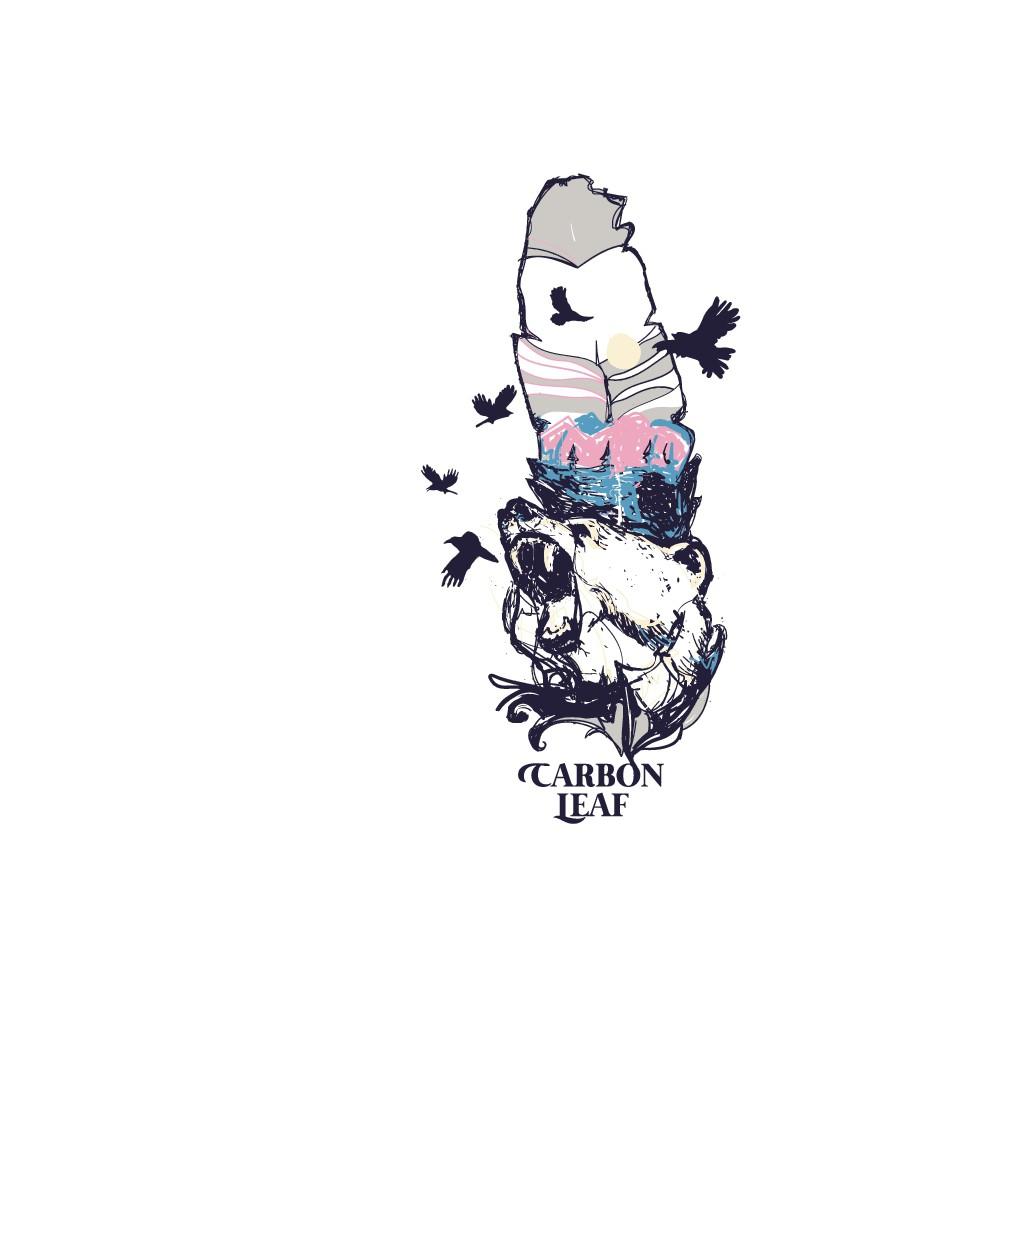 Bear&Crow Graphic Design Using Existing Artwork